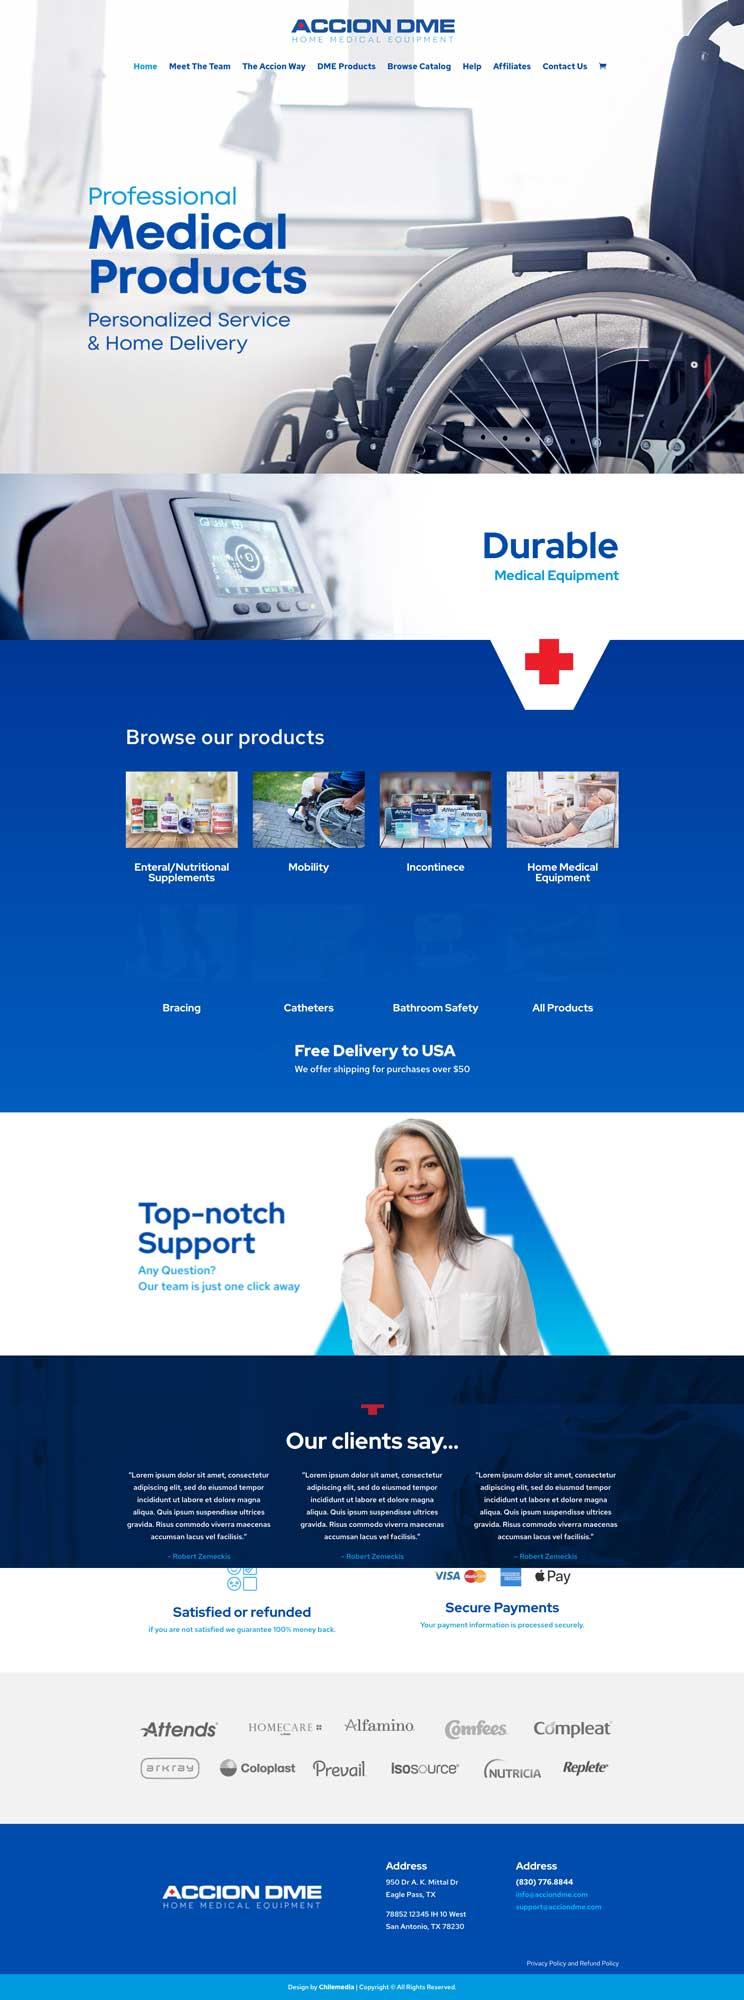 accion dme homepage webpage